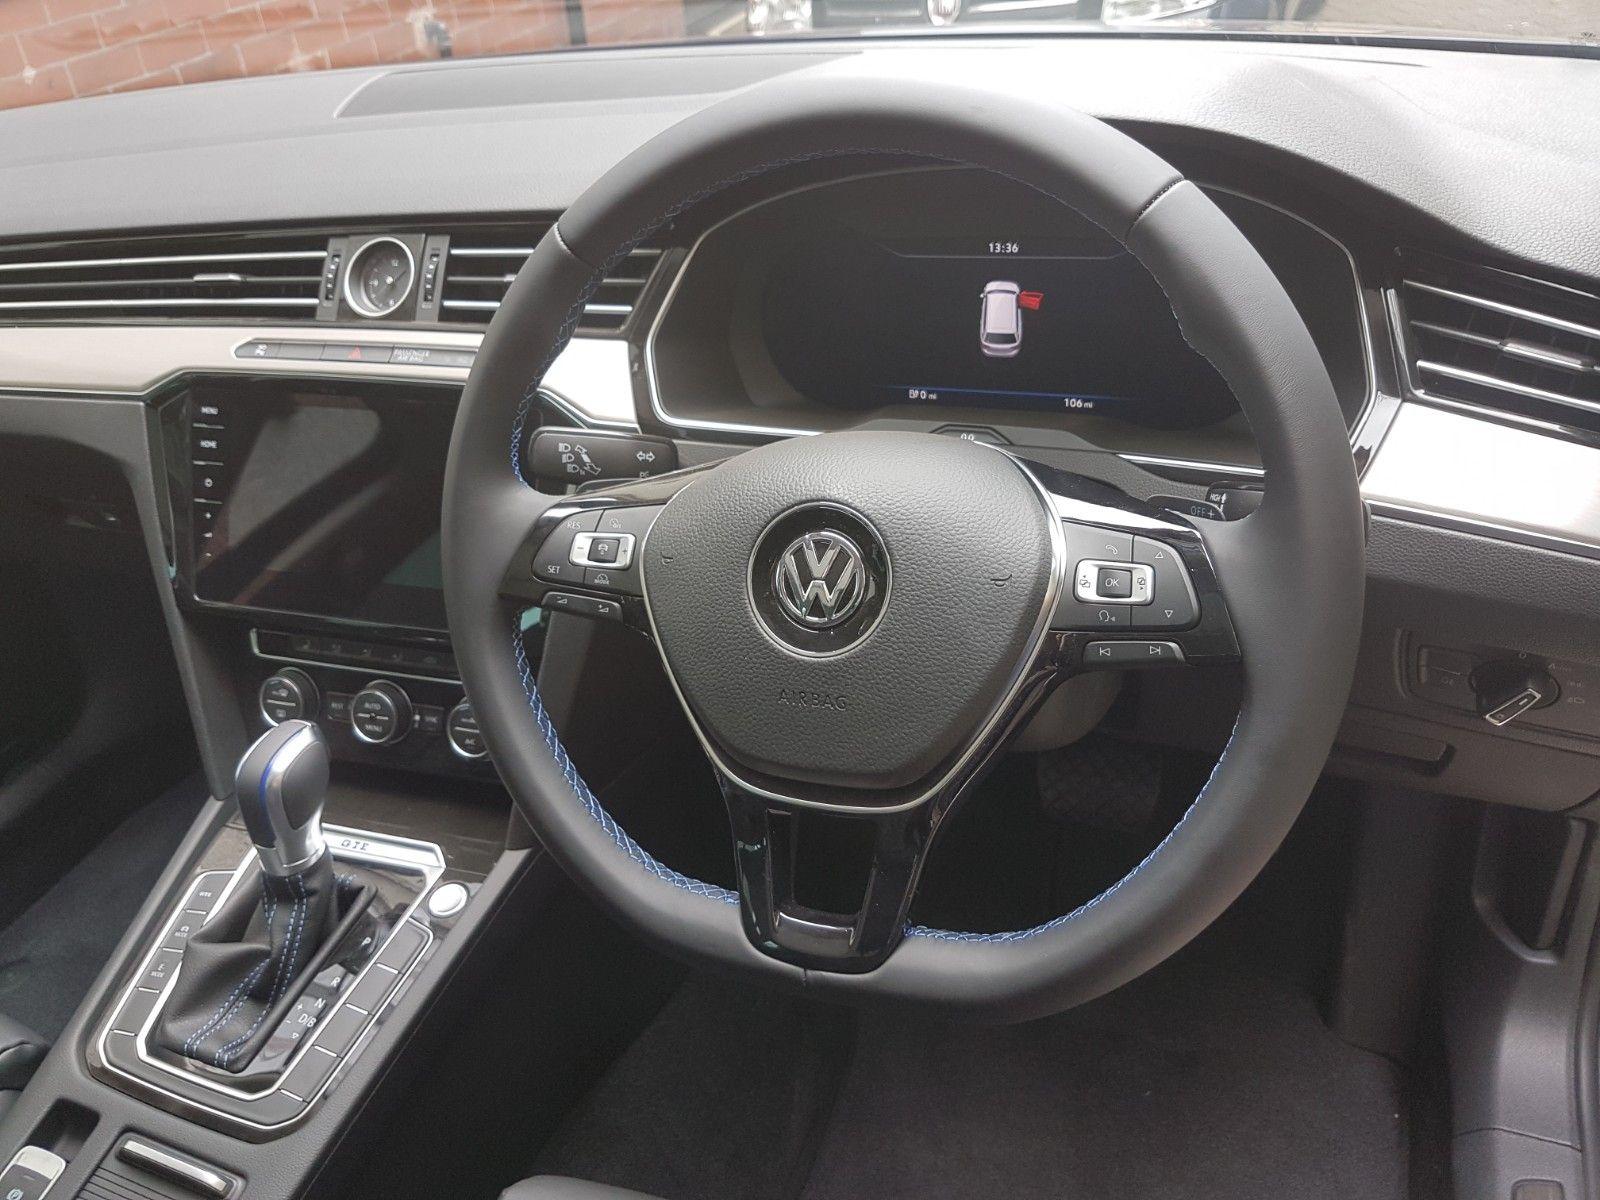 The Volkswagen Passat Estate 1 4 Petrol Gte Advance 5 Door Dsg Car Leasing Deal Vw Newcar Leasing Volkswagen Passat Volkswagen Car Lease